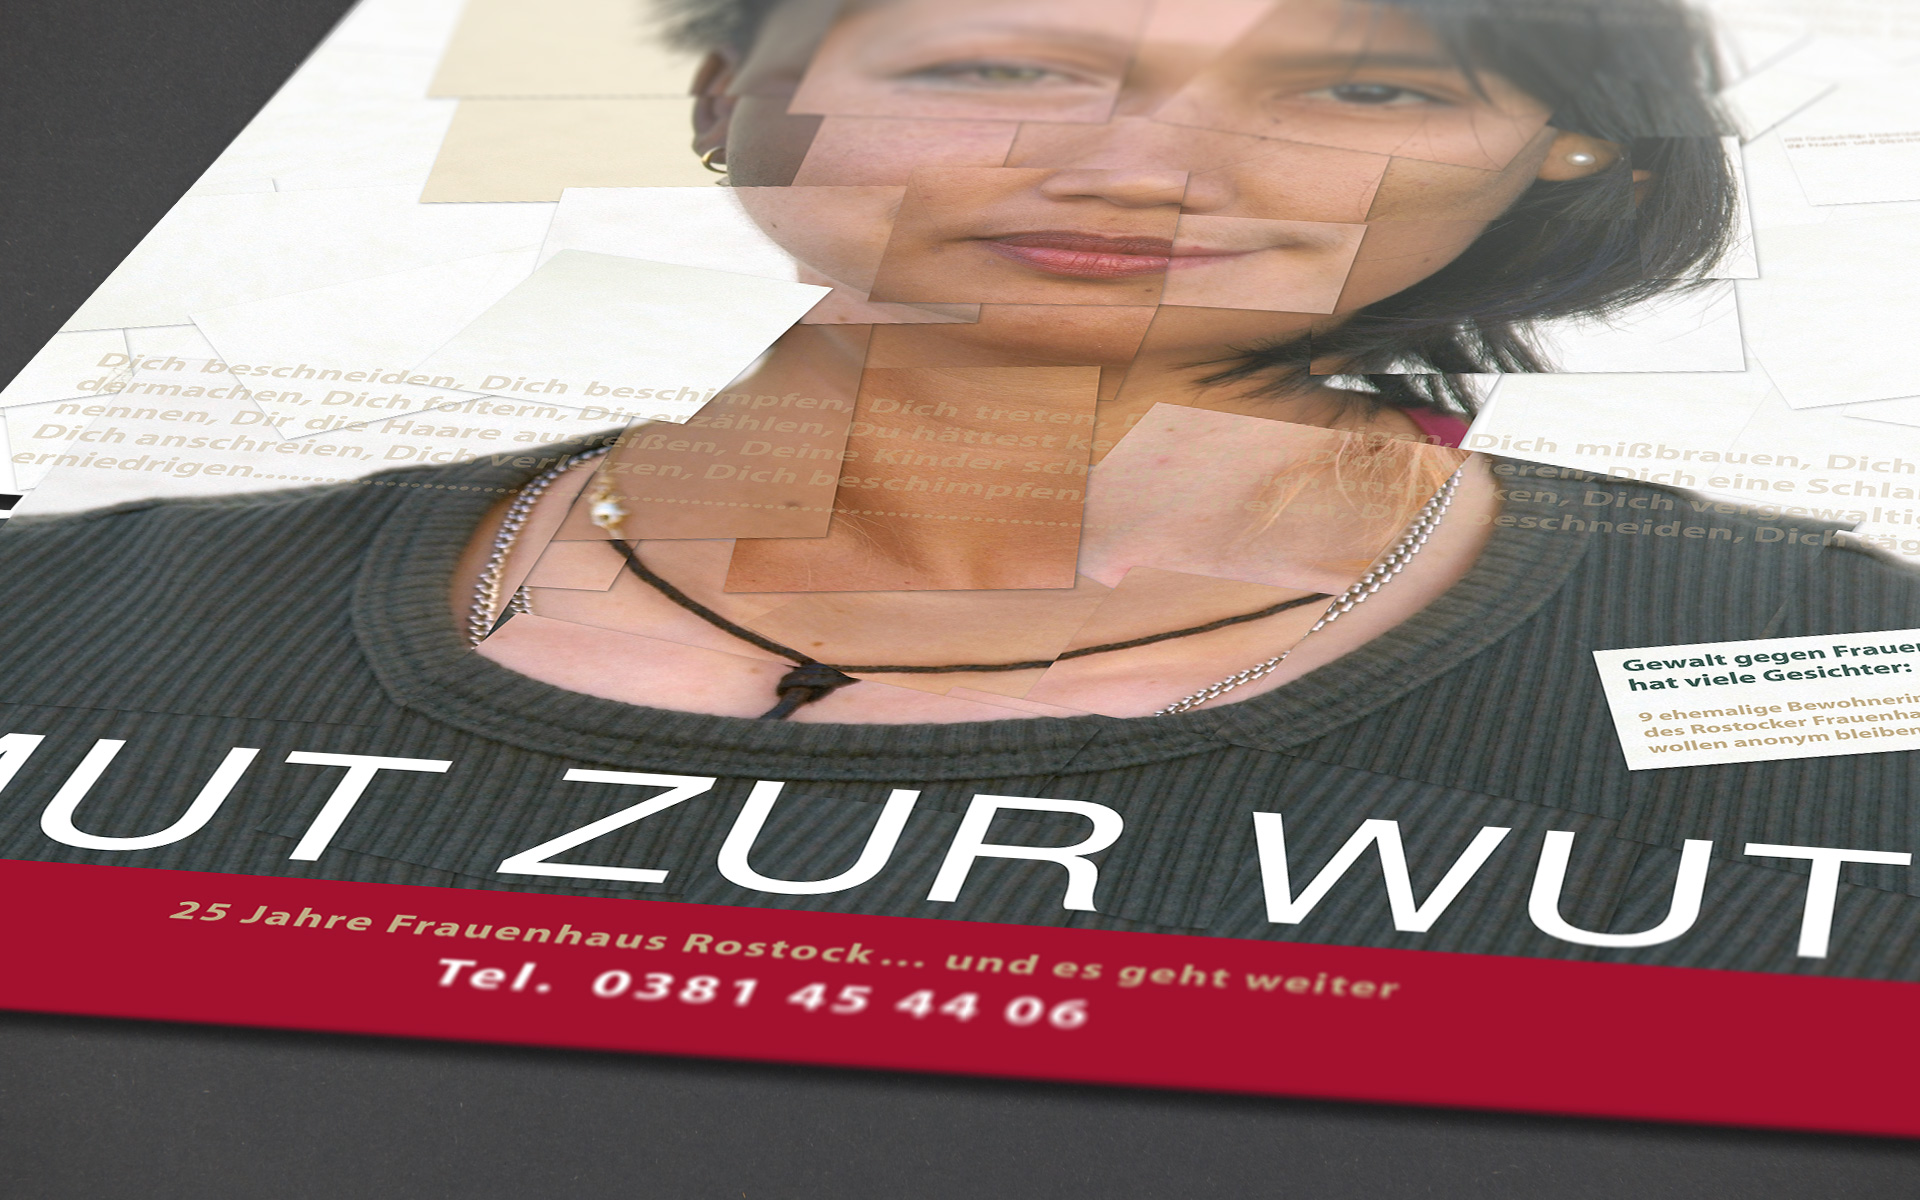 Plakatmoiv 25 Jahre Frauenhaus Rostock